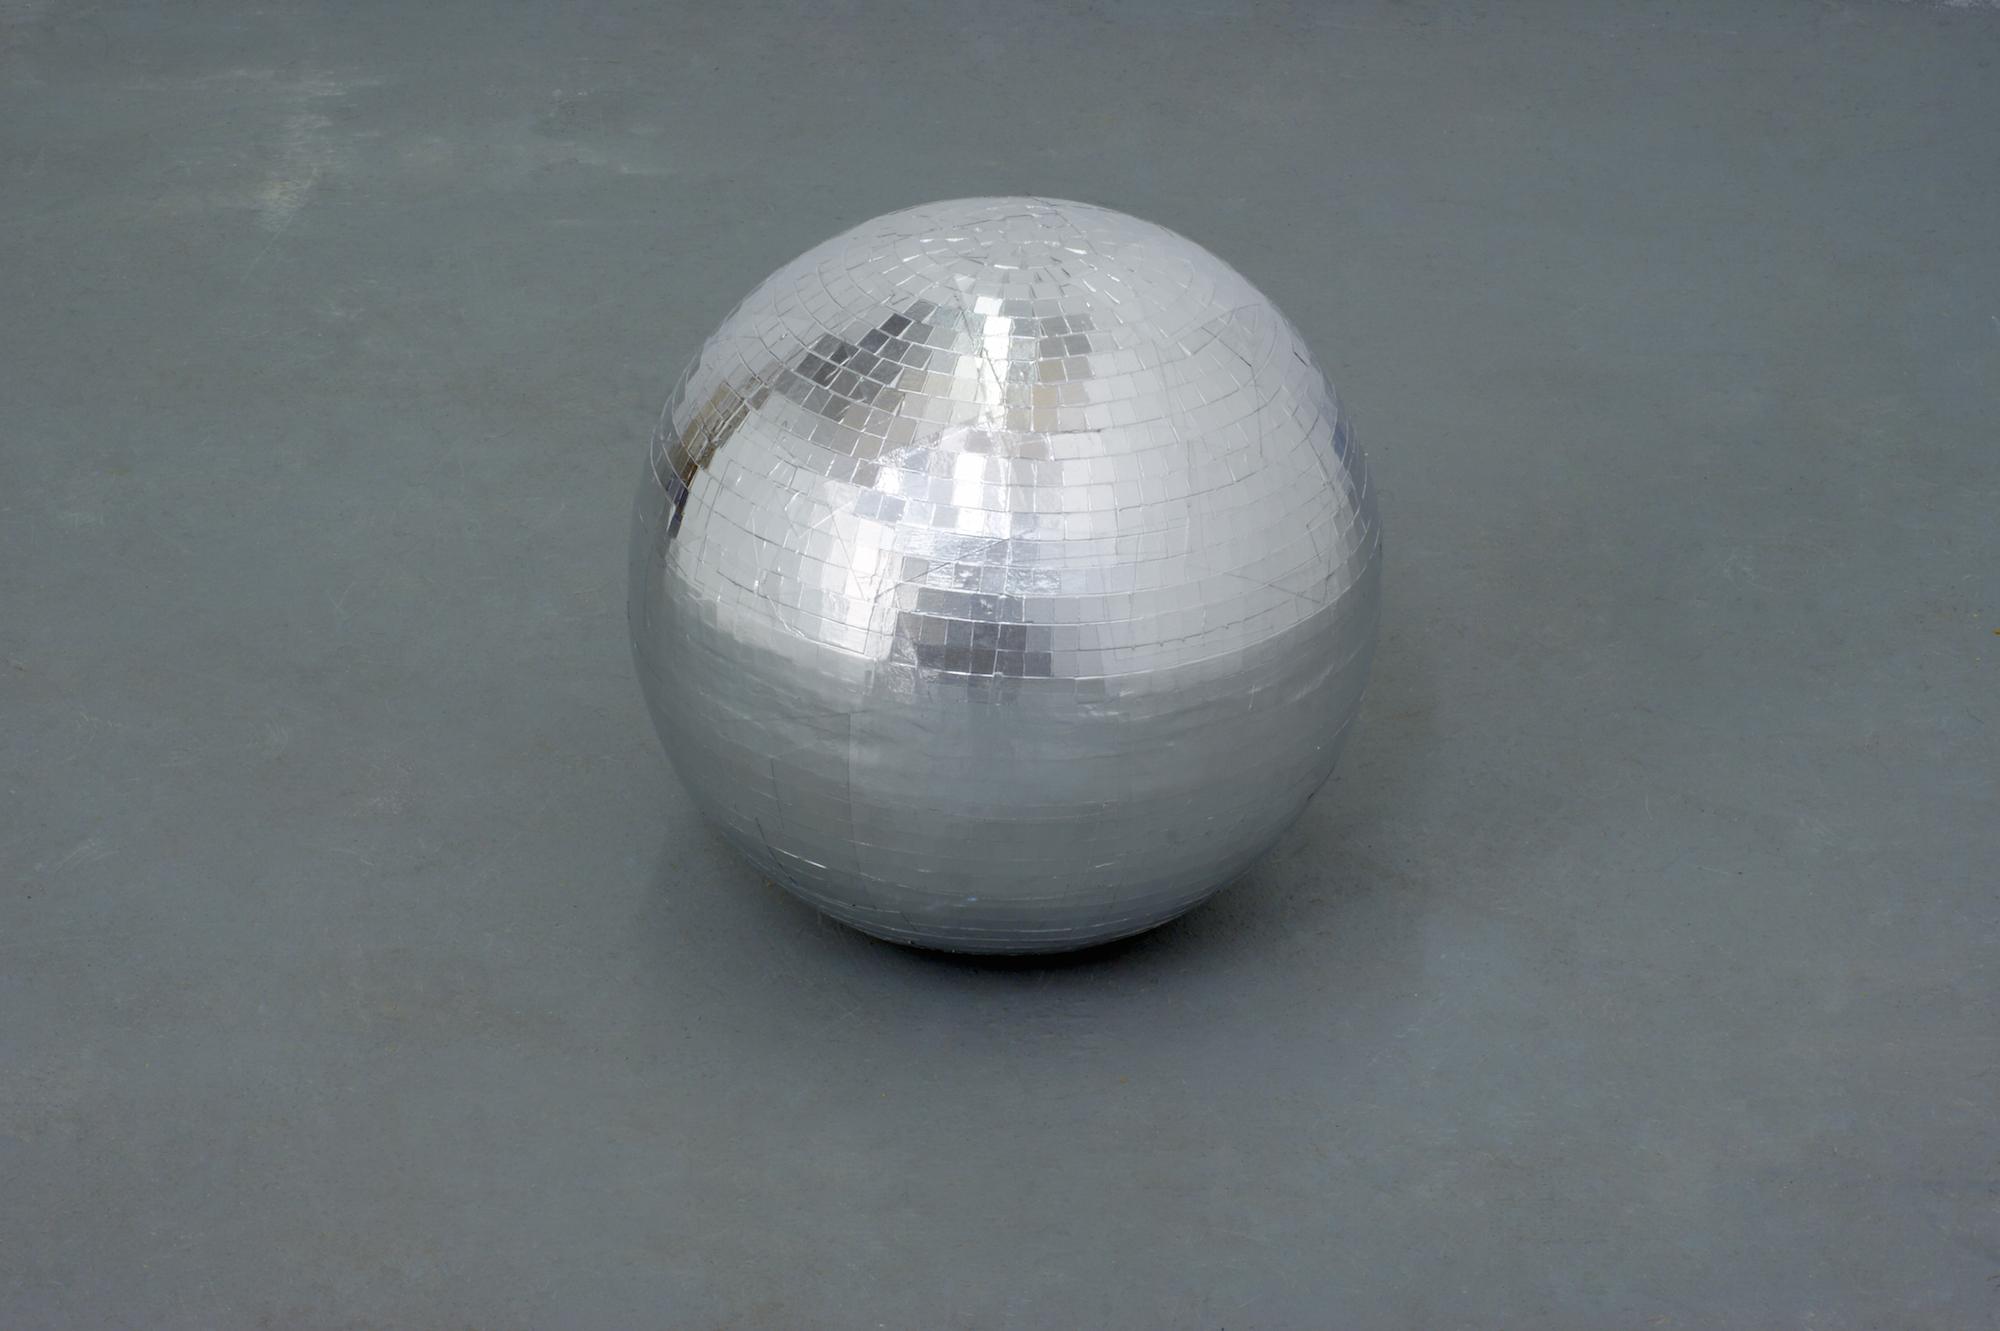 Caline Aoun  Disco ball 2015 Plaster, aluminum tape 40 cm diameter